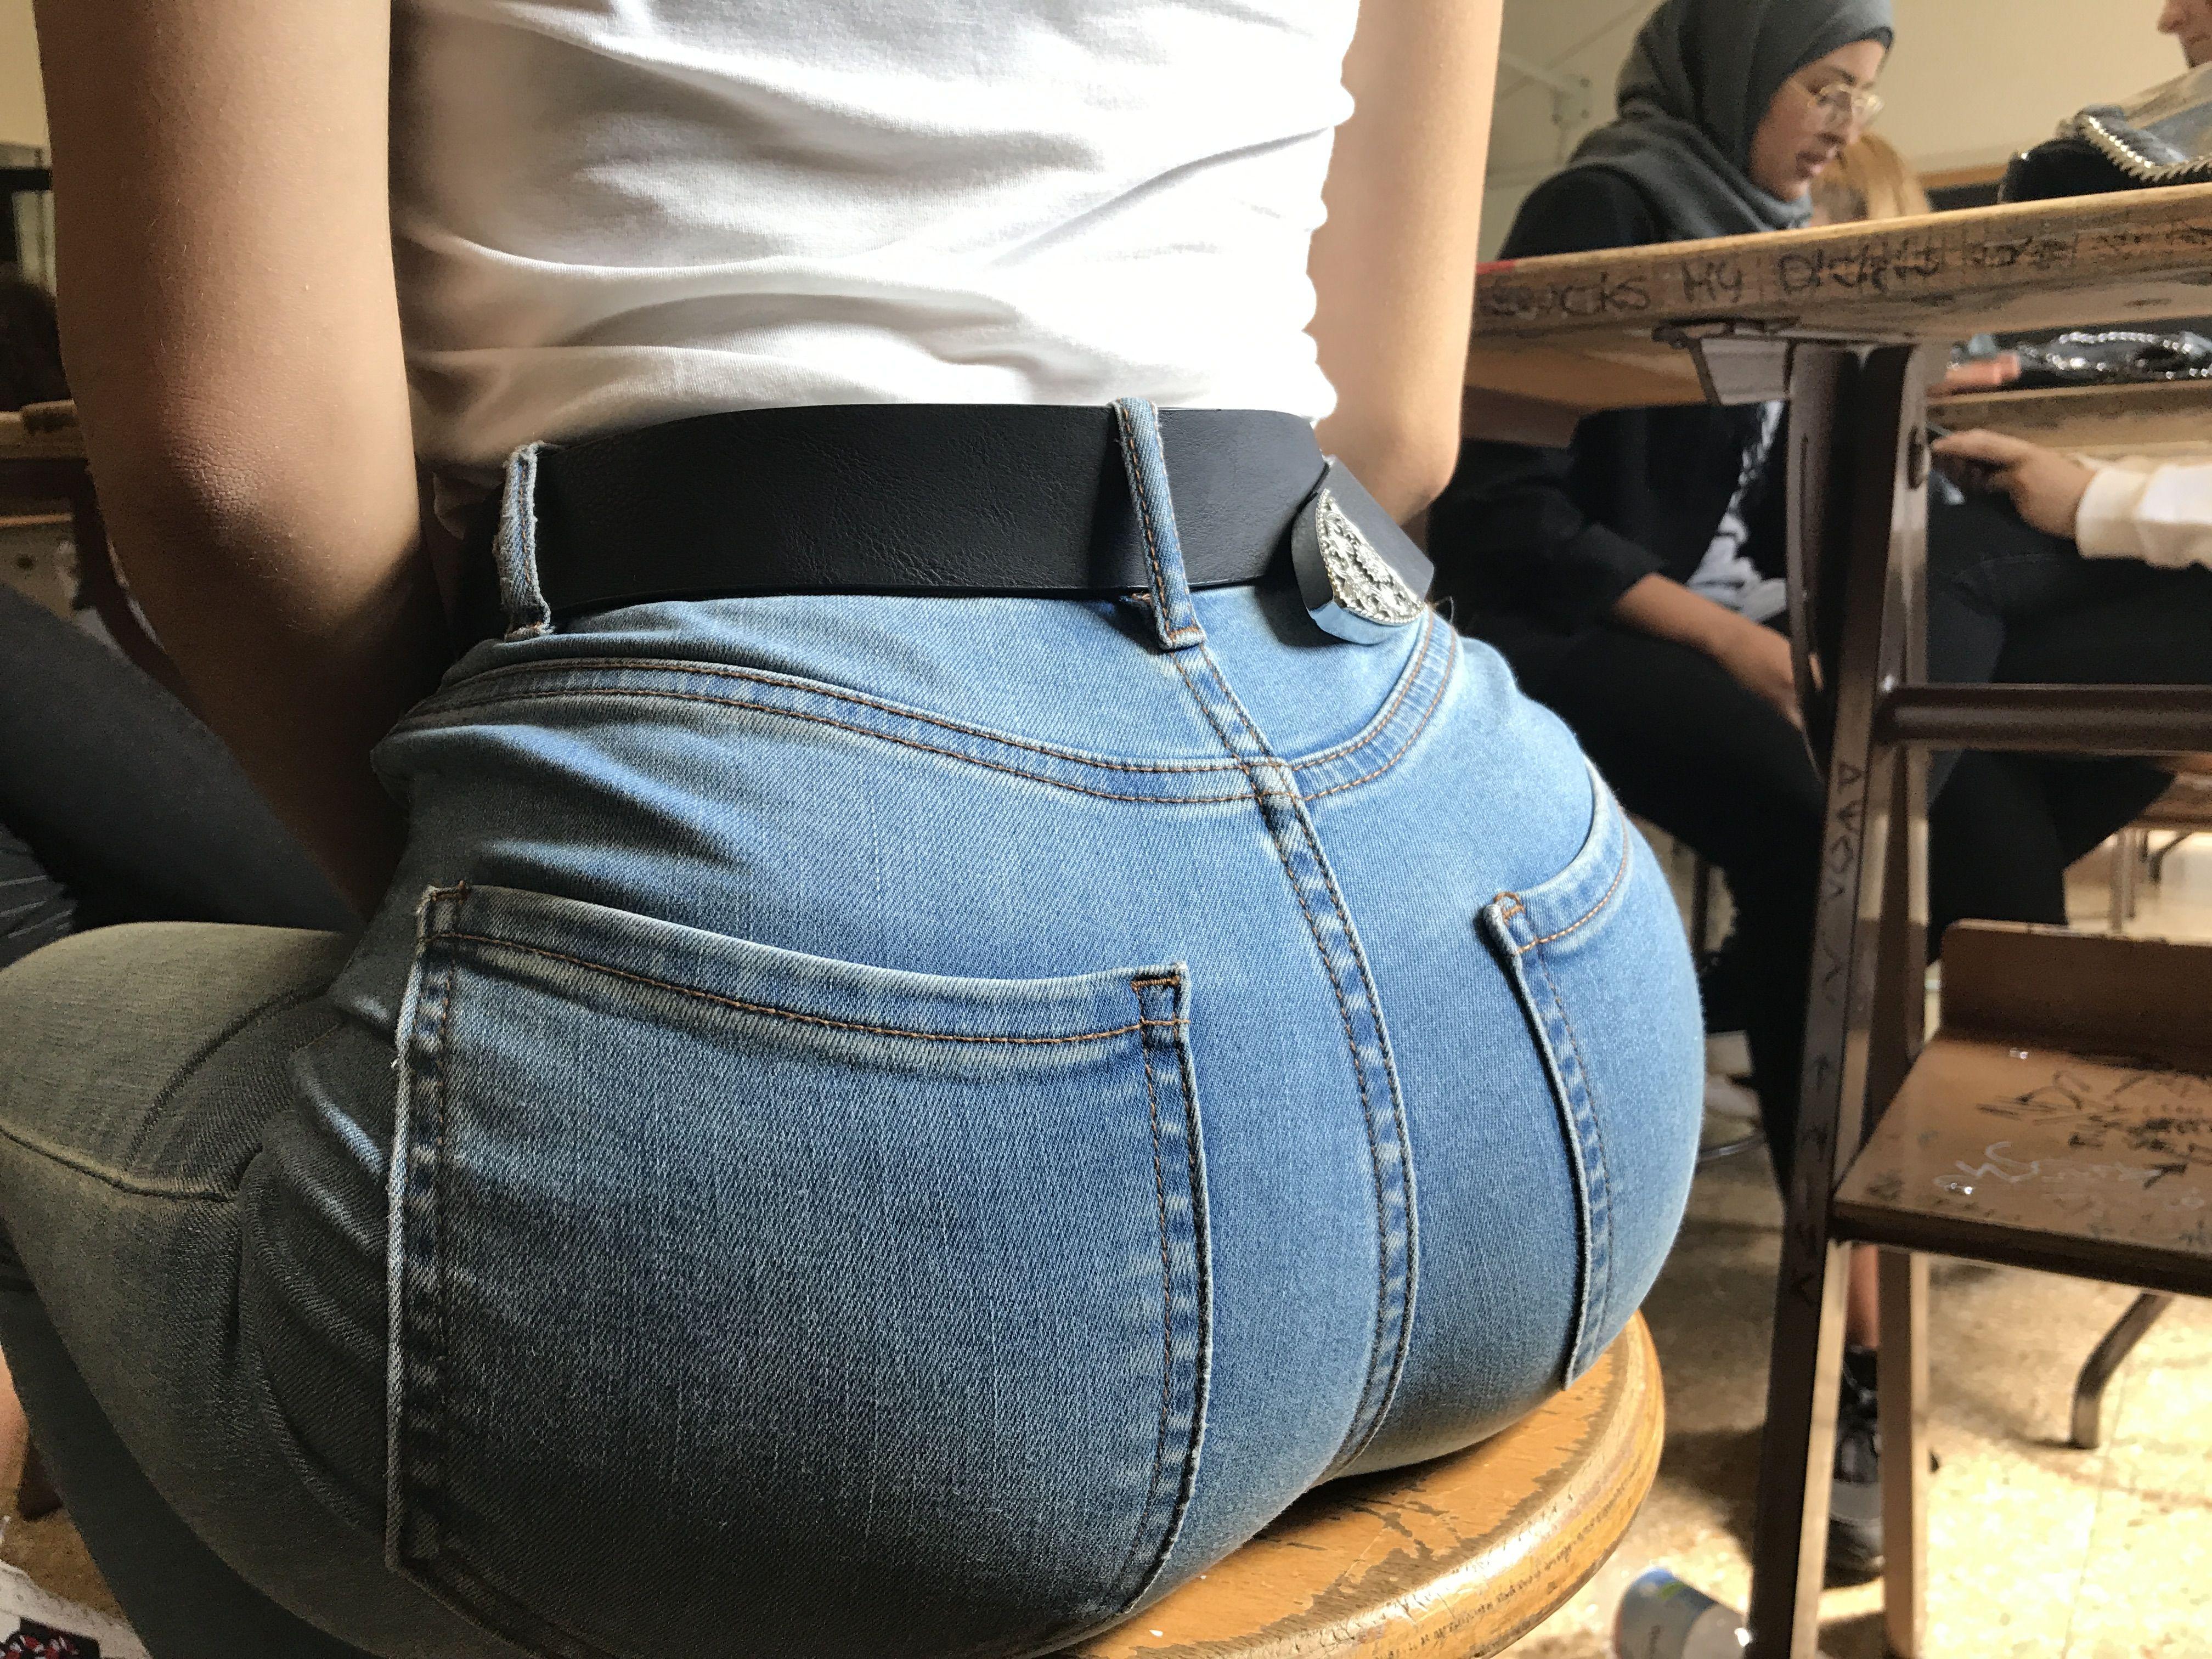 Jeans geile ärsche in Enge Jeans